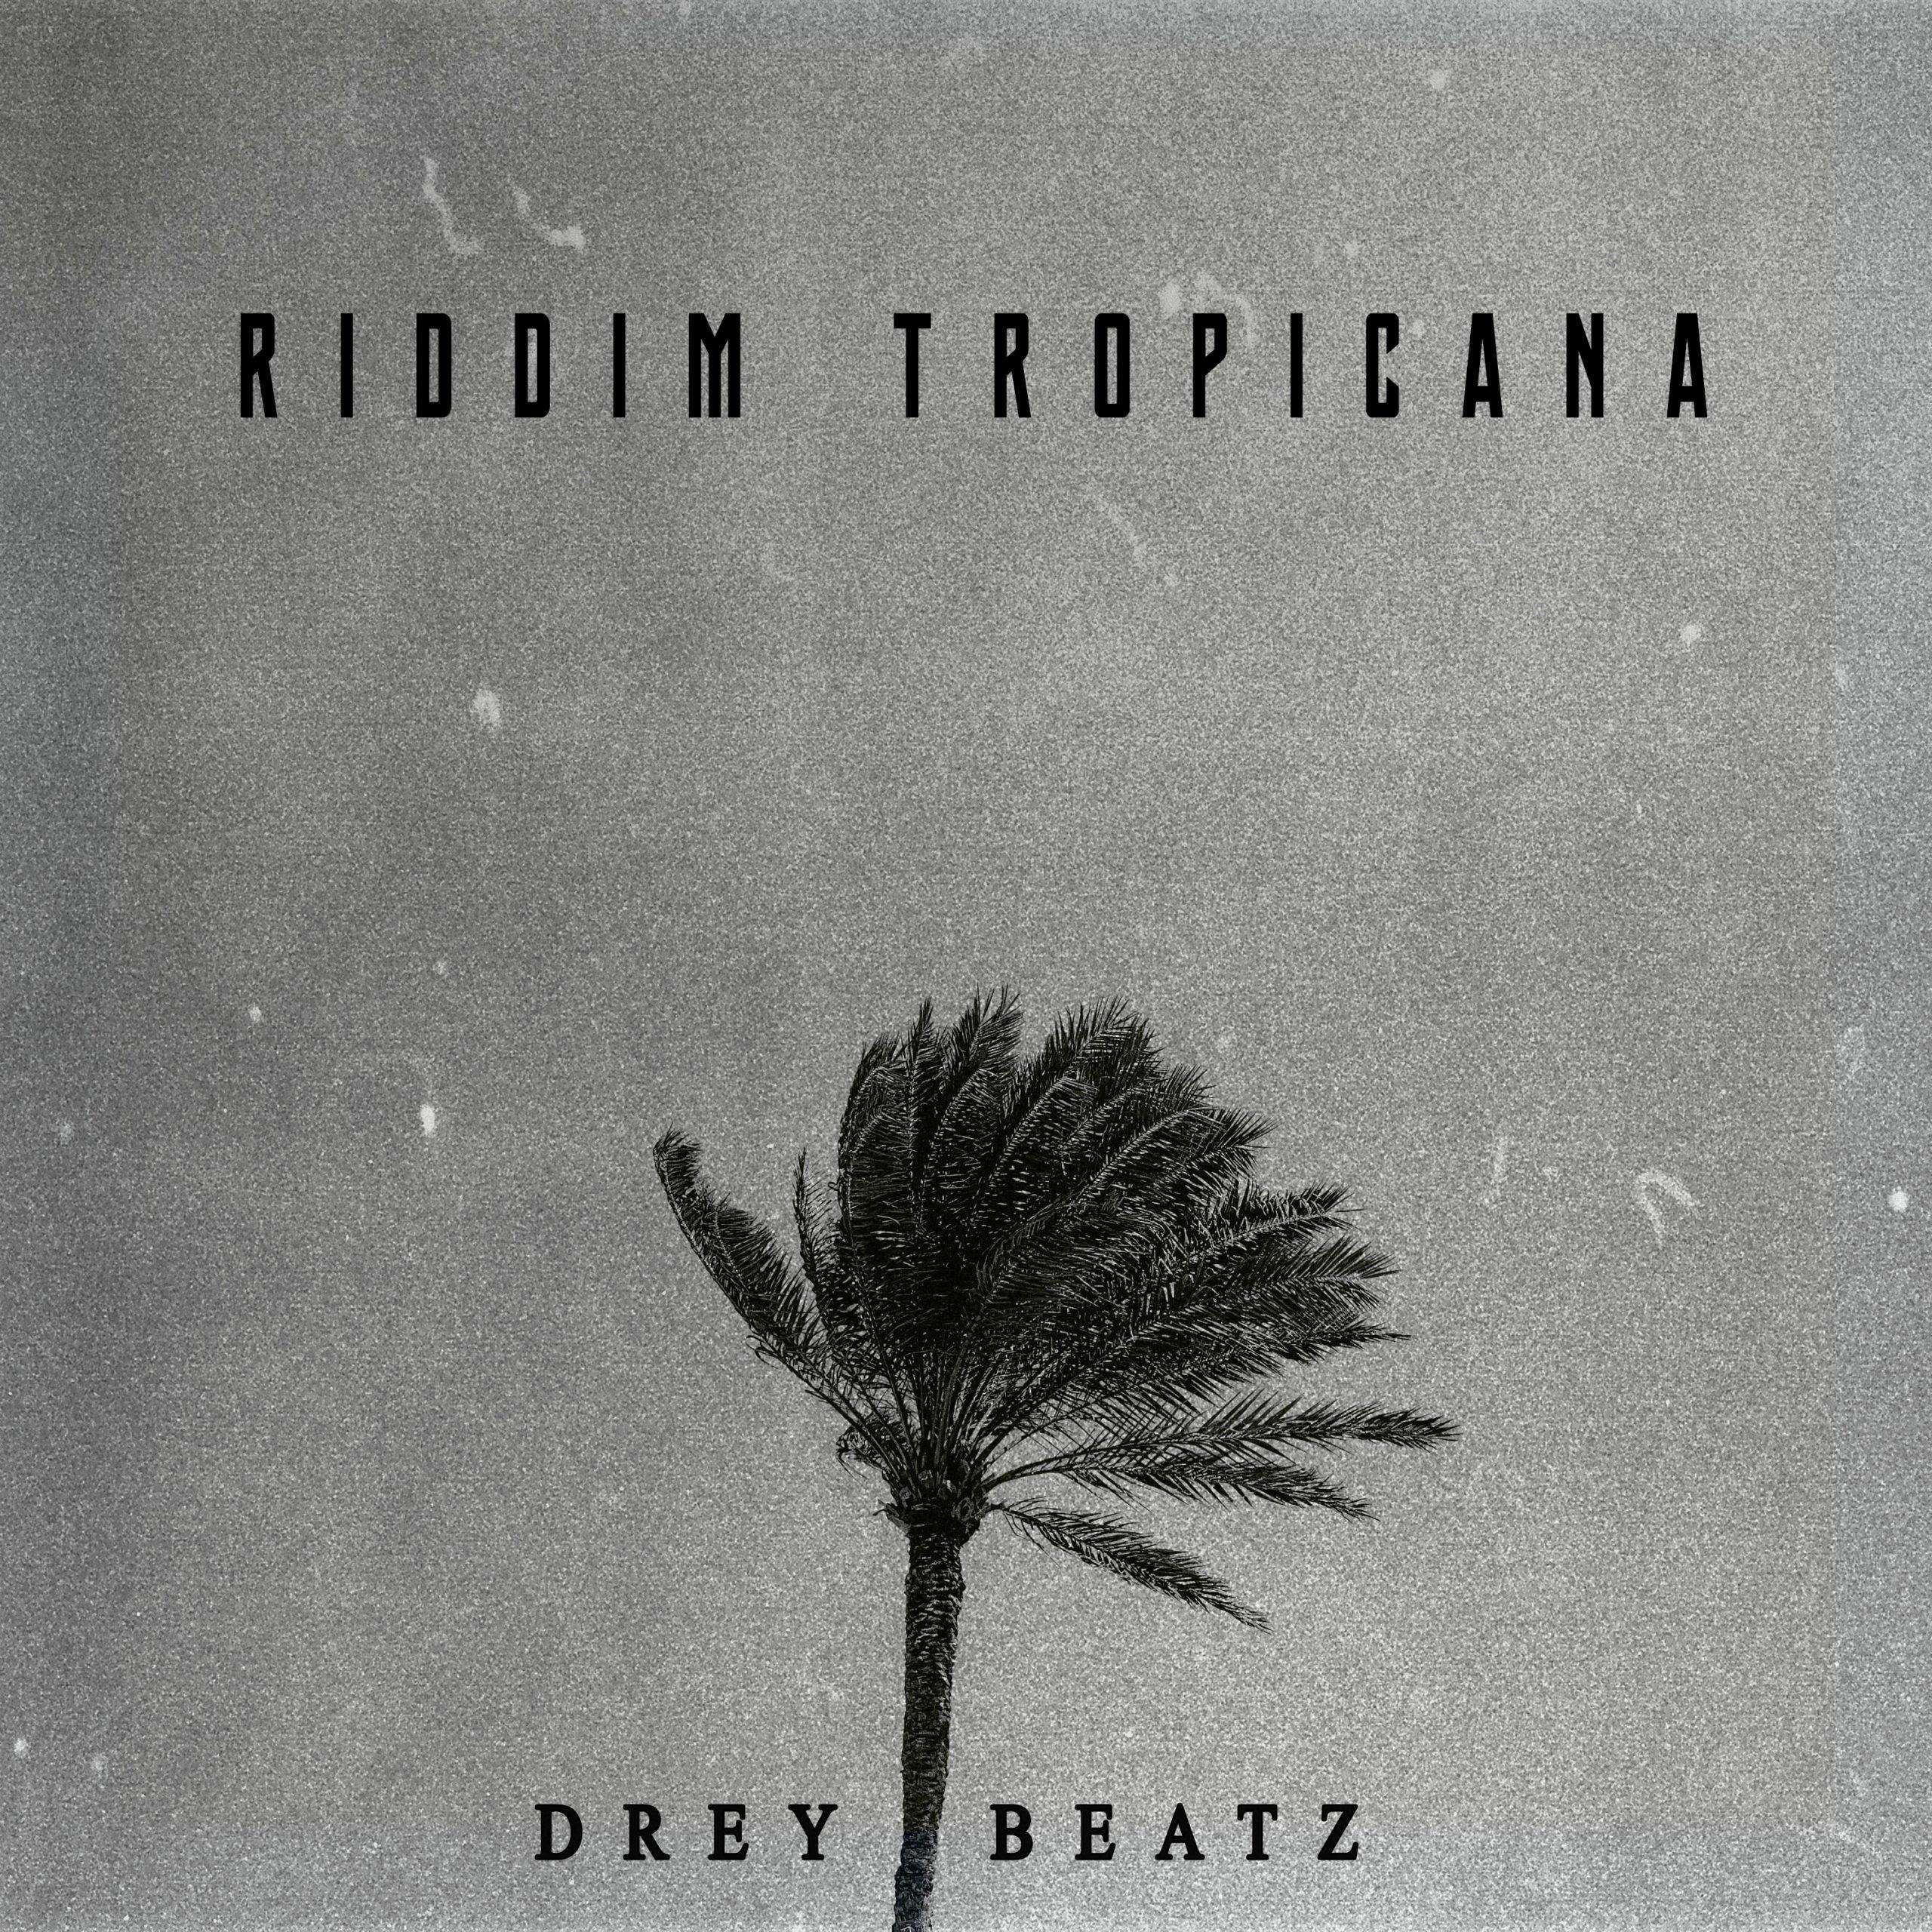 Drey Beatz - Riddim Tropicana